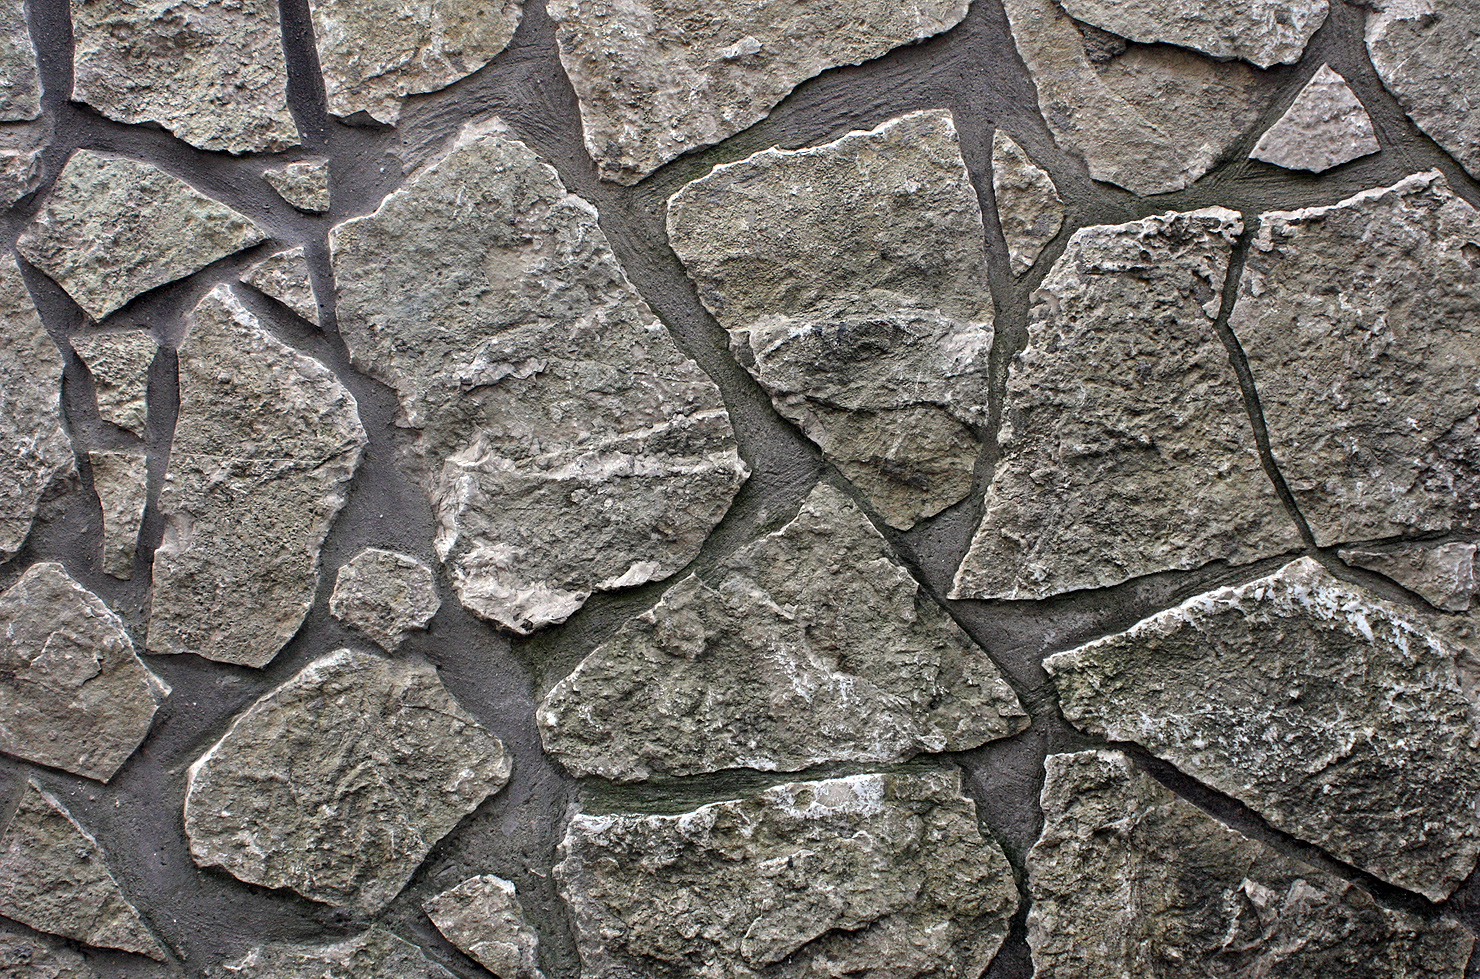 exterior stone wall tiles textures joy studio design. Black Bedroom Furniture Sets. Home Design Ideas